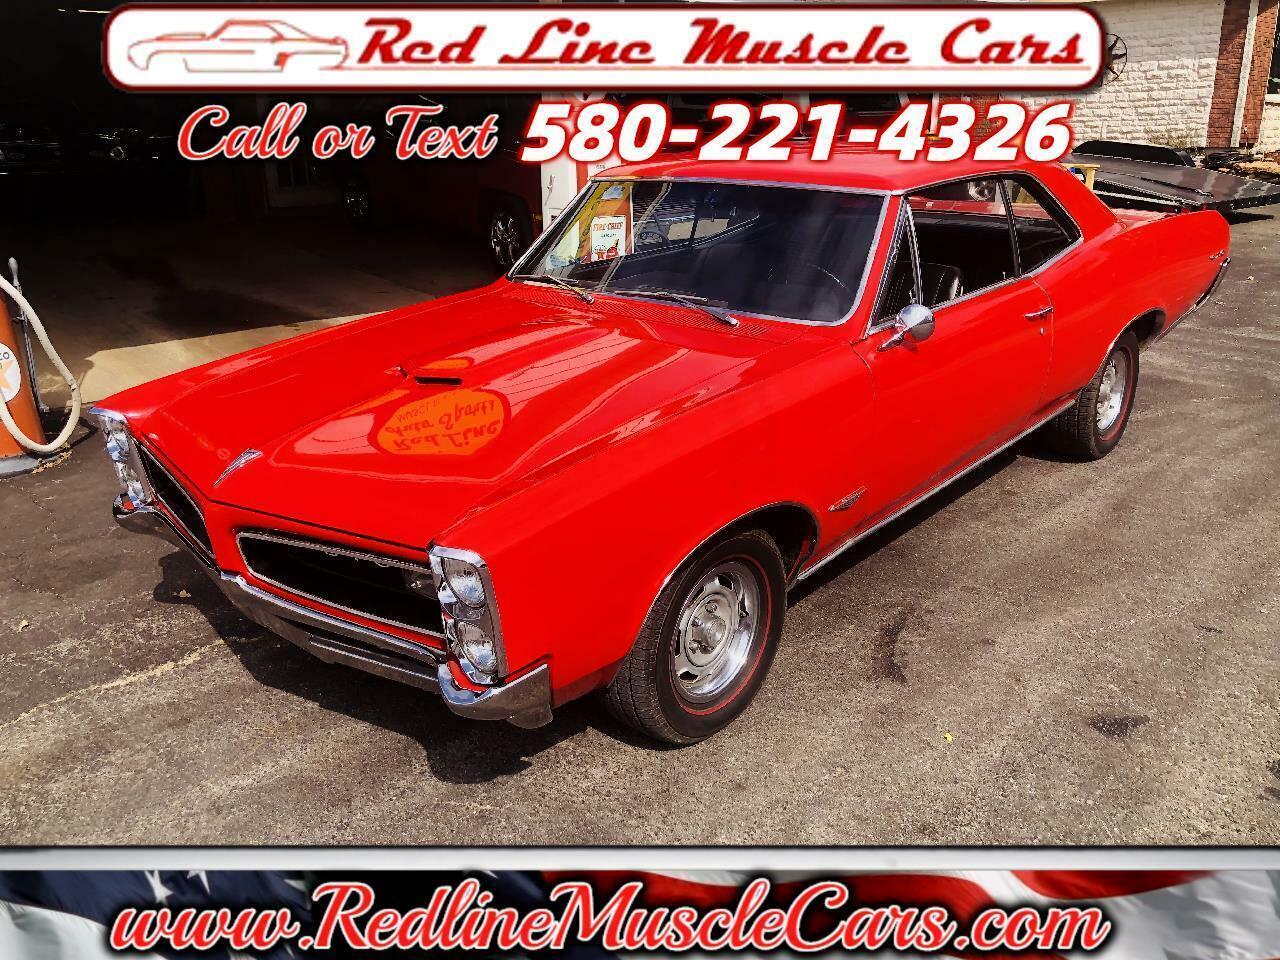 1966 Pontiac GTO 389/360hp 3x2 Tripower 2dr coupe